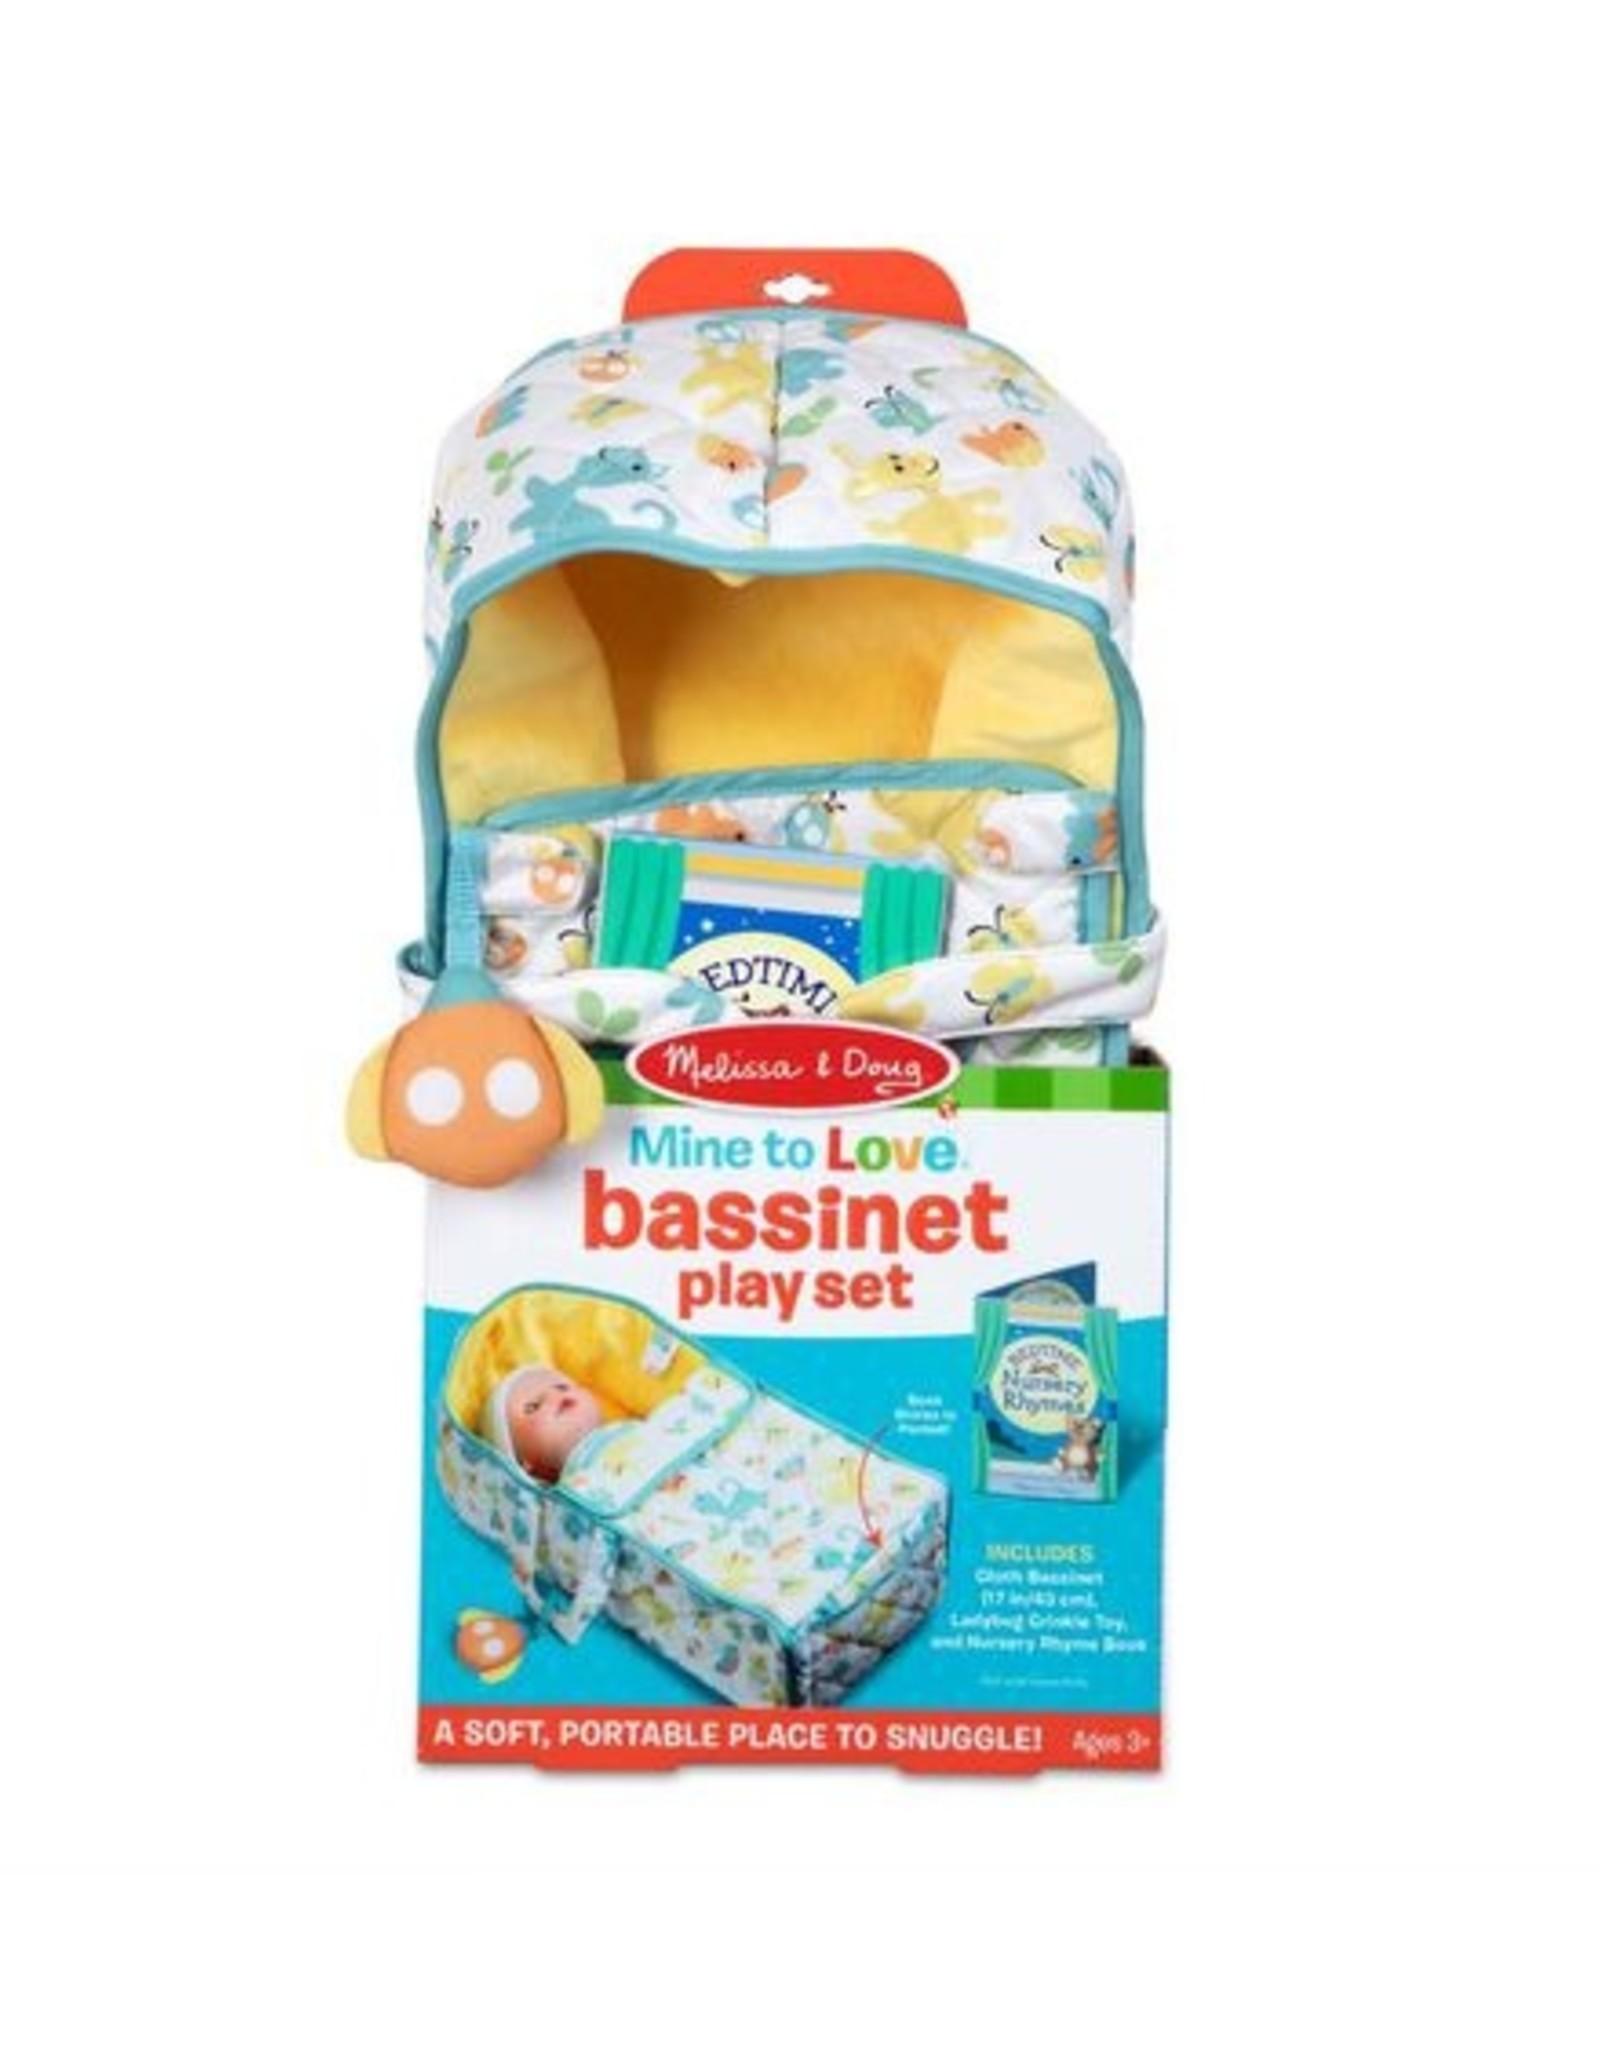 Melissa & Doug Mine to Love Bassinet Play Set